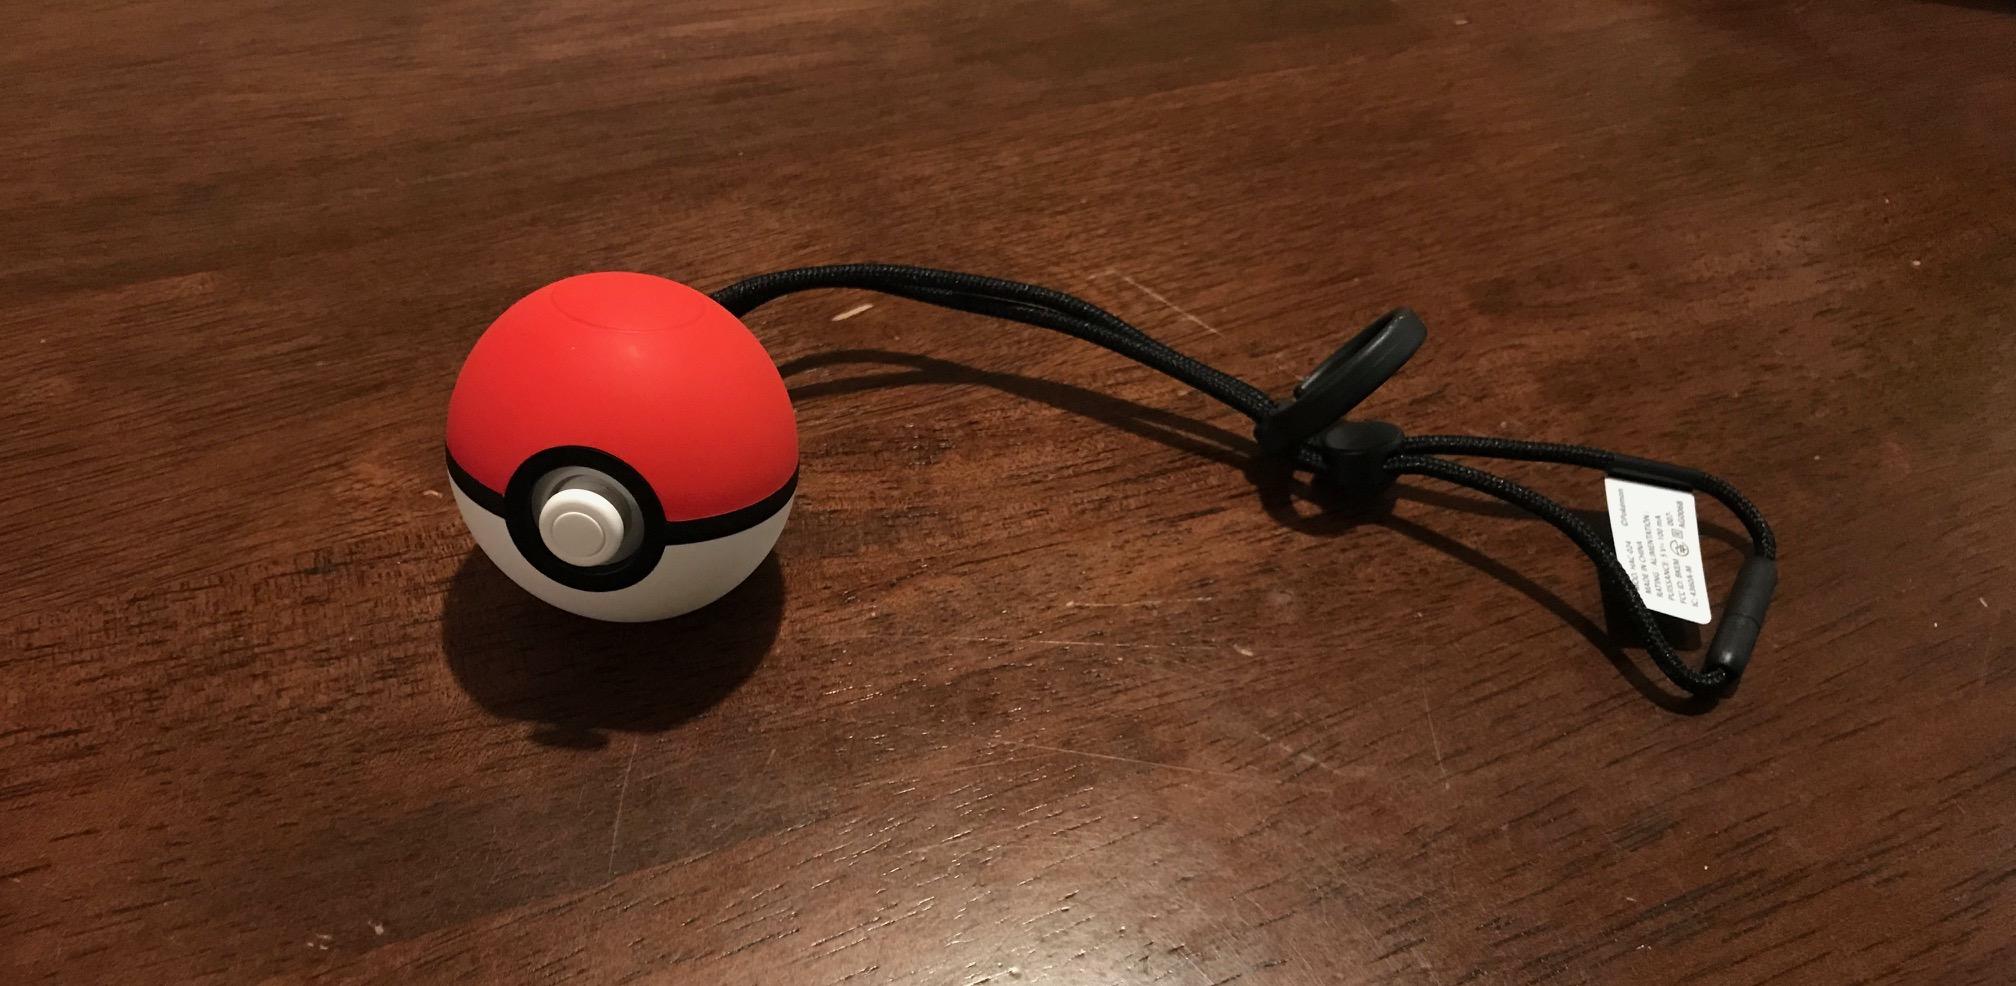 Review: Pokemon Let's Go Pikachu & Eevee